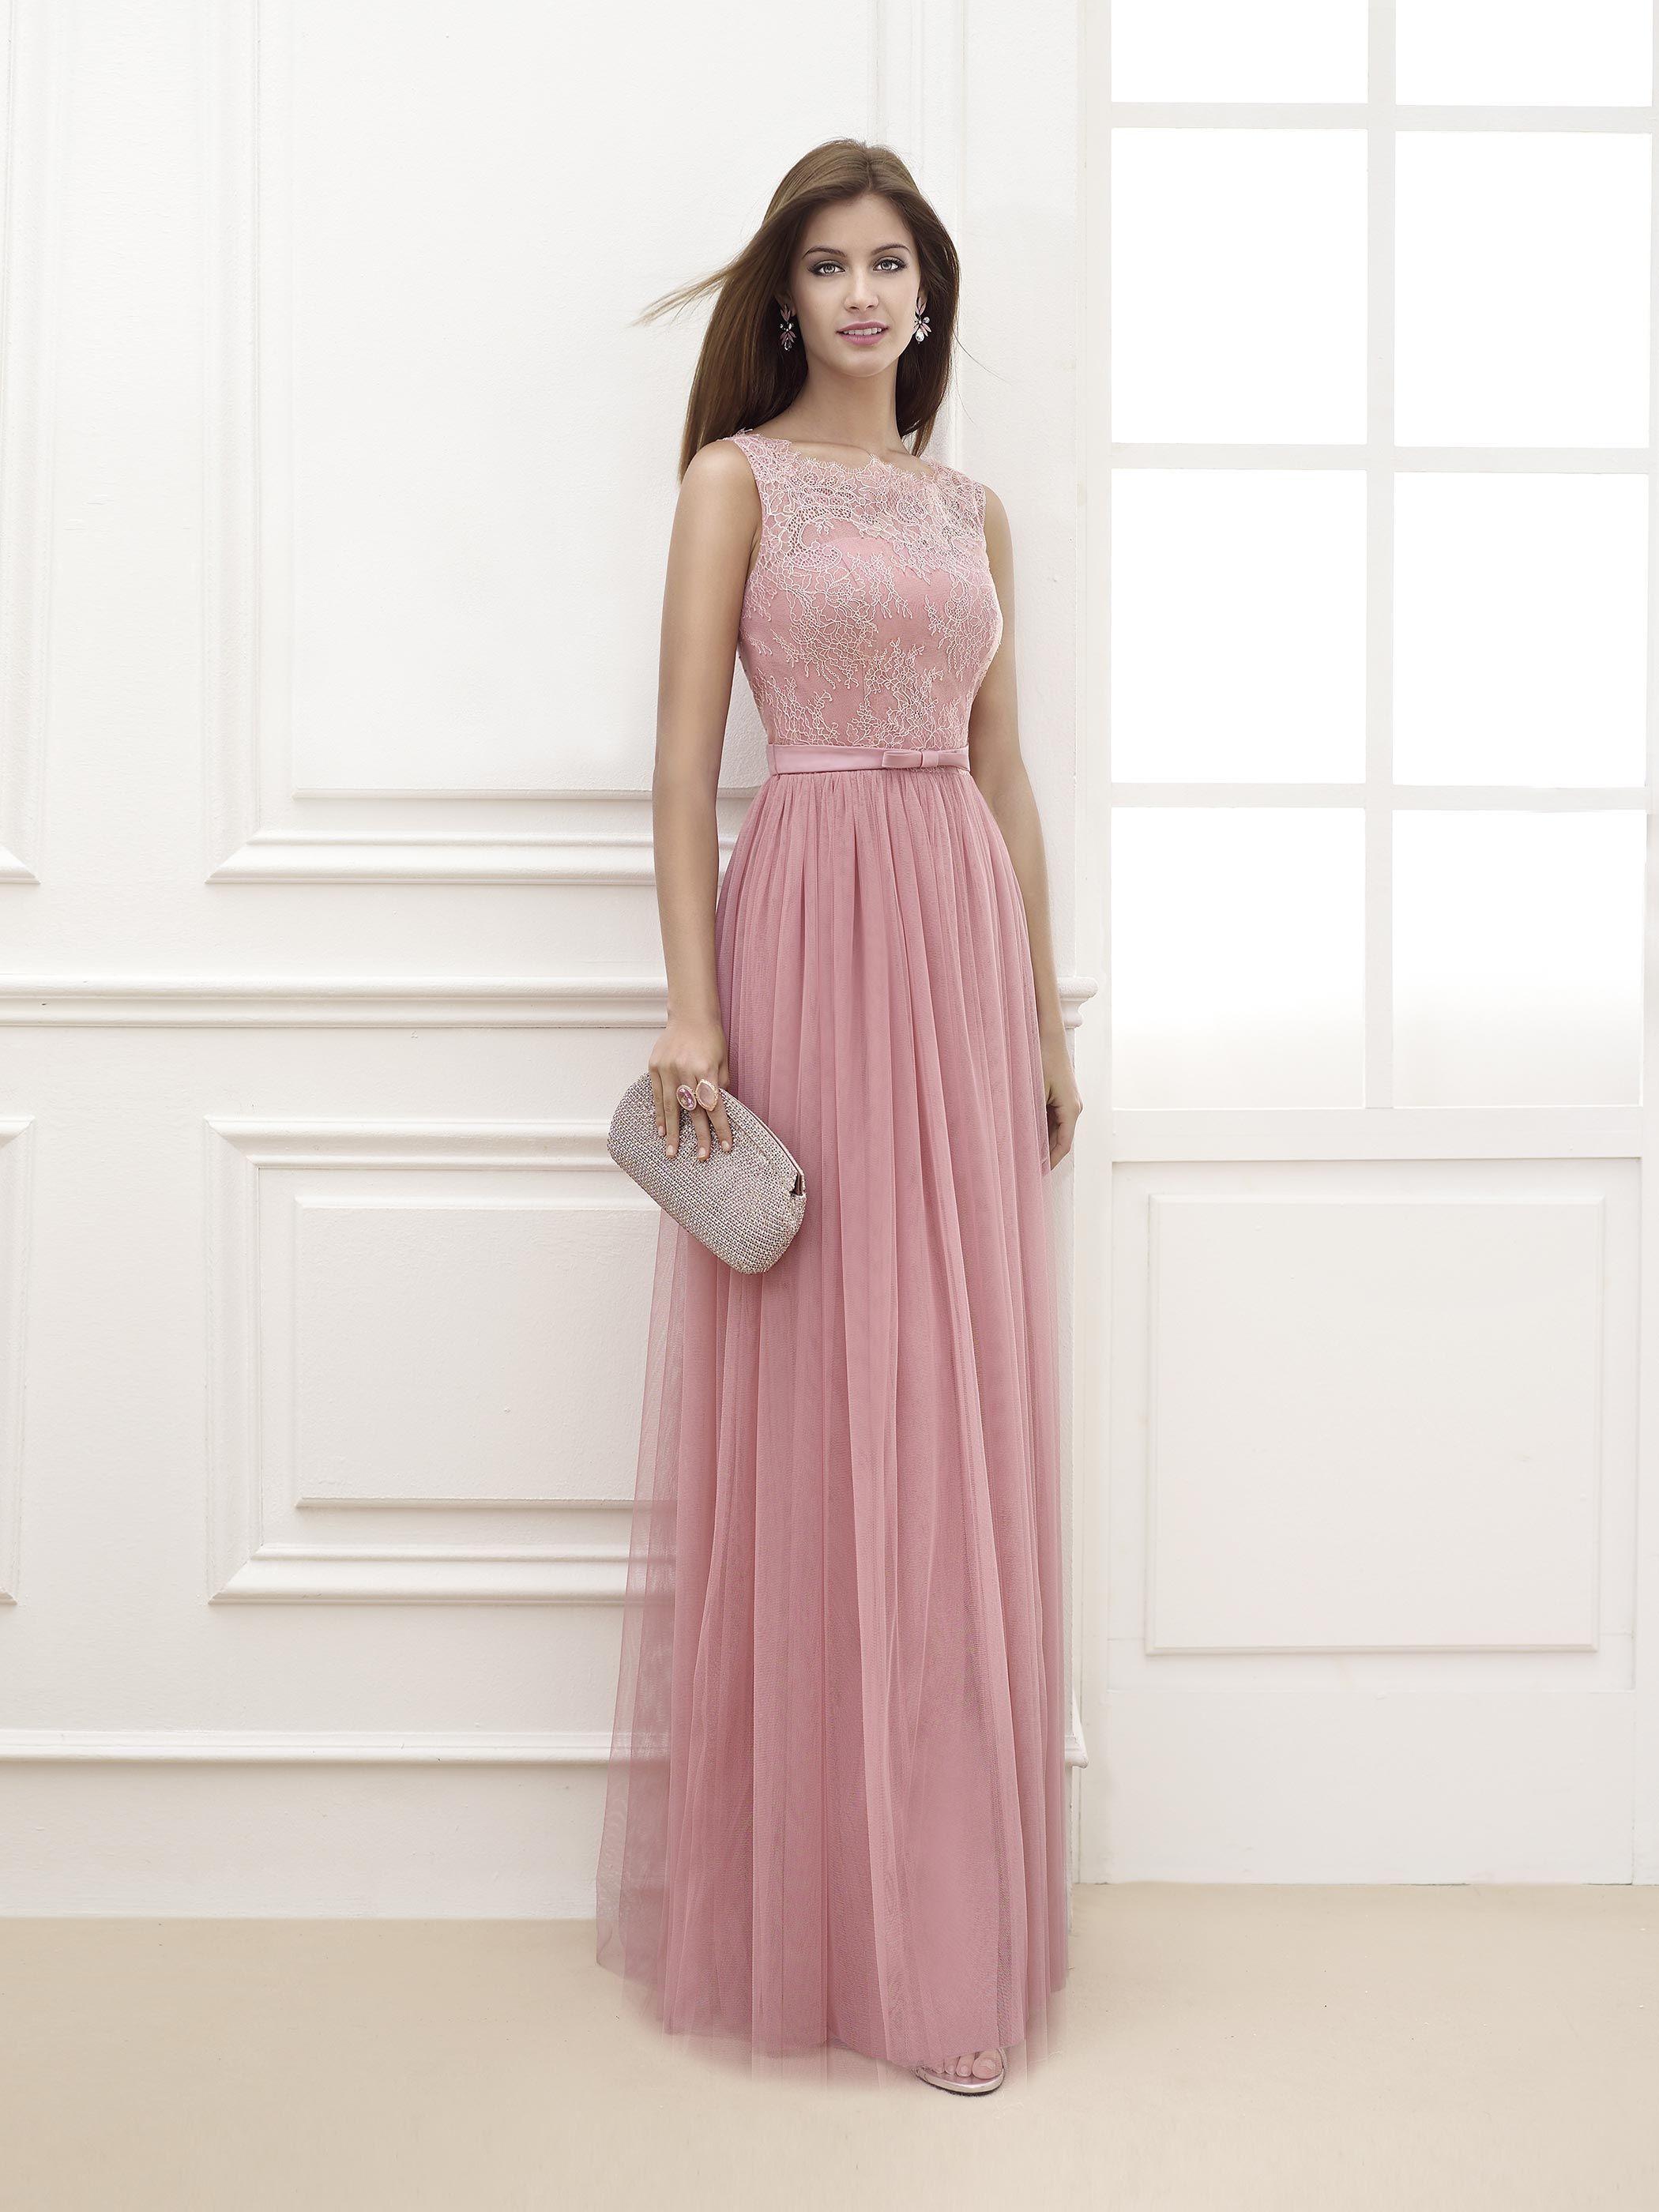 Vistoso Vestido Novia Griego Modelo - Colección de Vestidos de Boda ...